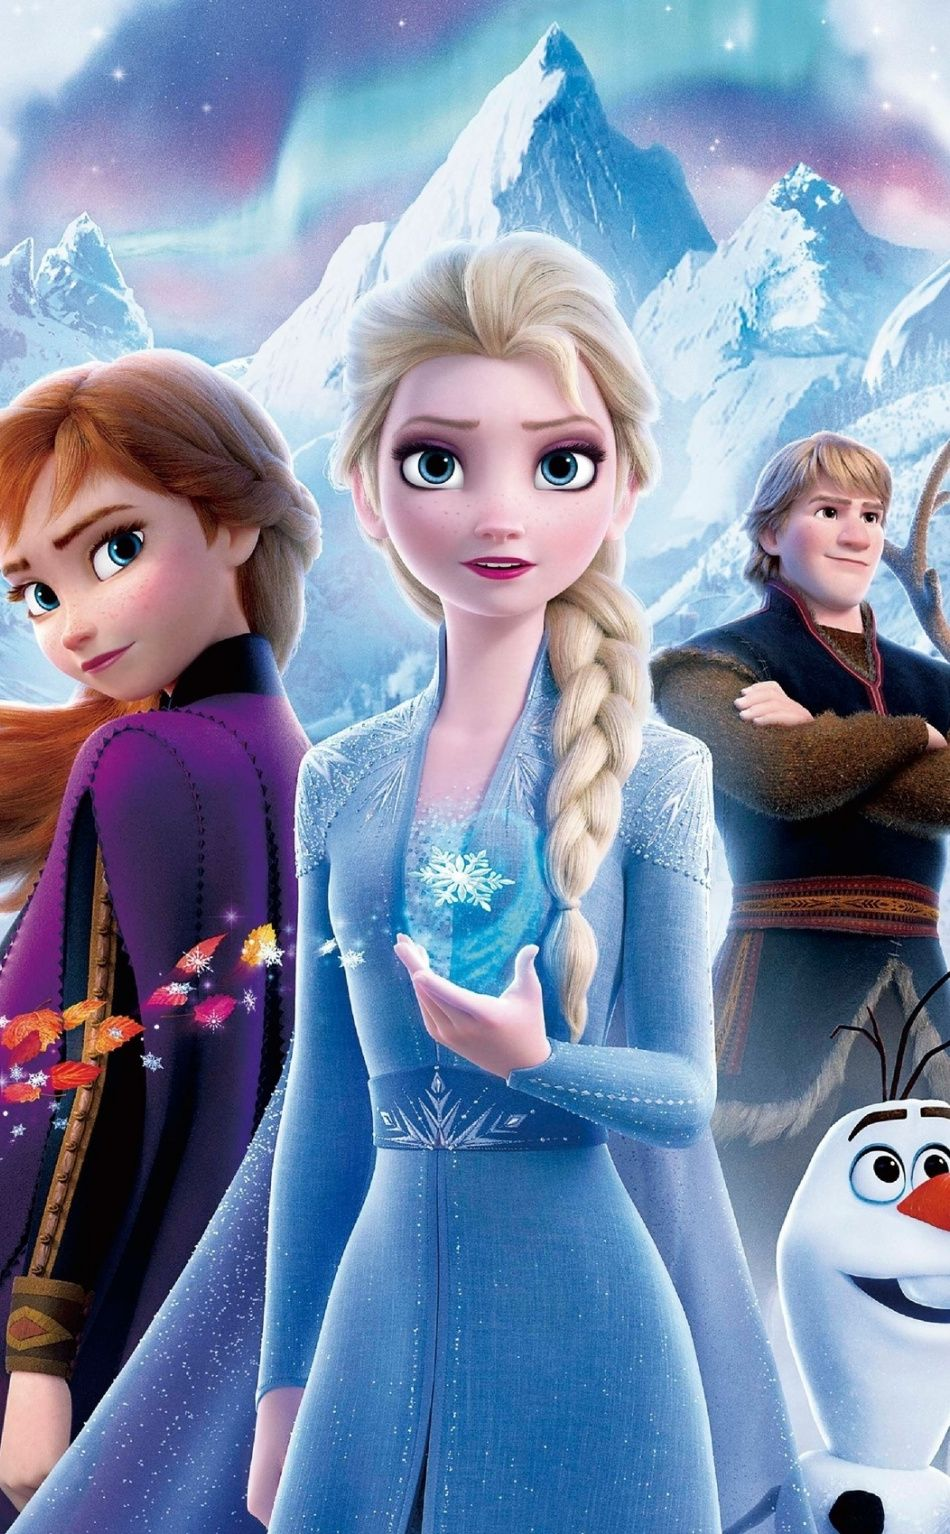 950x1534 Frozen 2 Princess Sisters Movie 2019 Wallpaper Disney Frozen Elsa Art Frozen Pictures Wallpaper Iphone Disney Princess